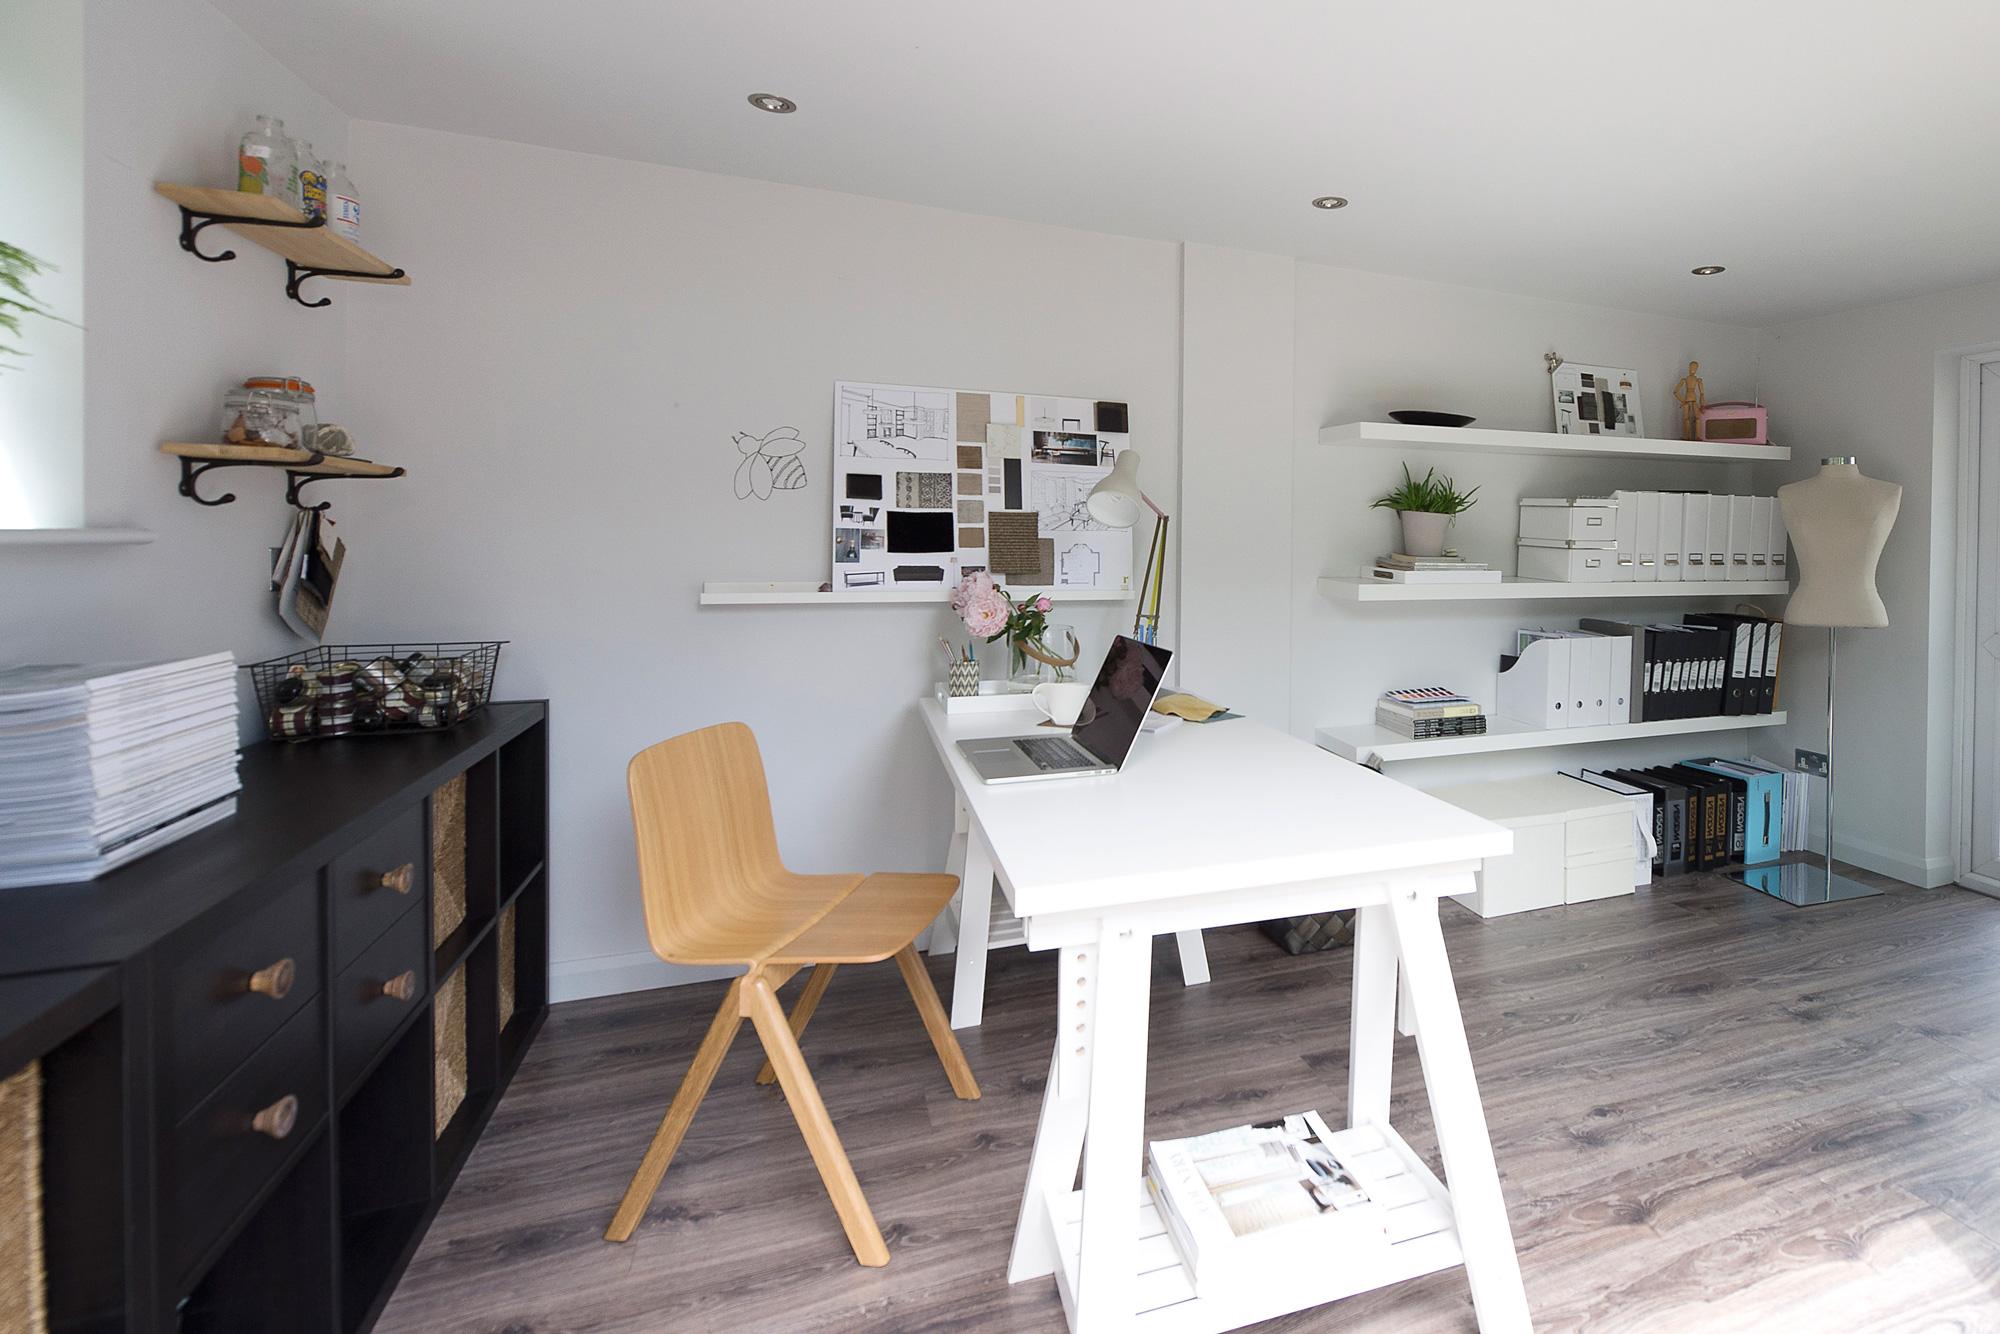 3-Nikki-Rees-studio-home-office-desk